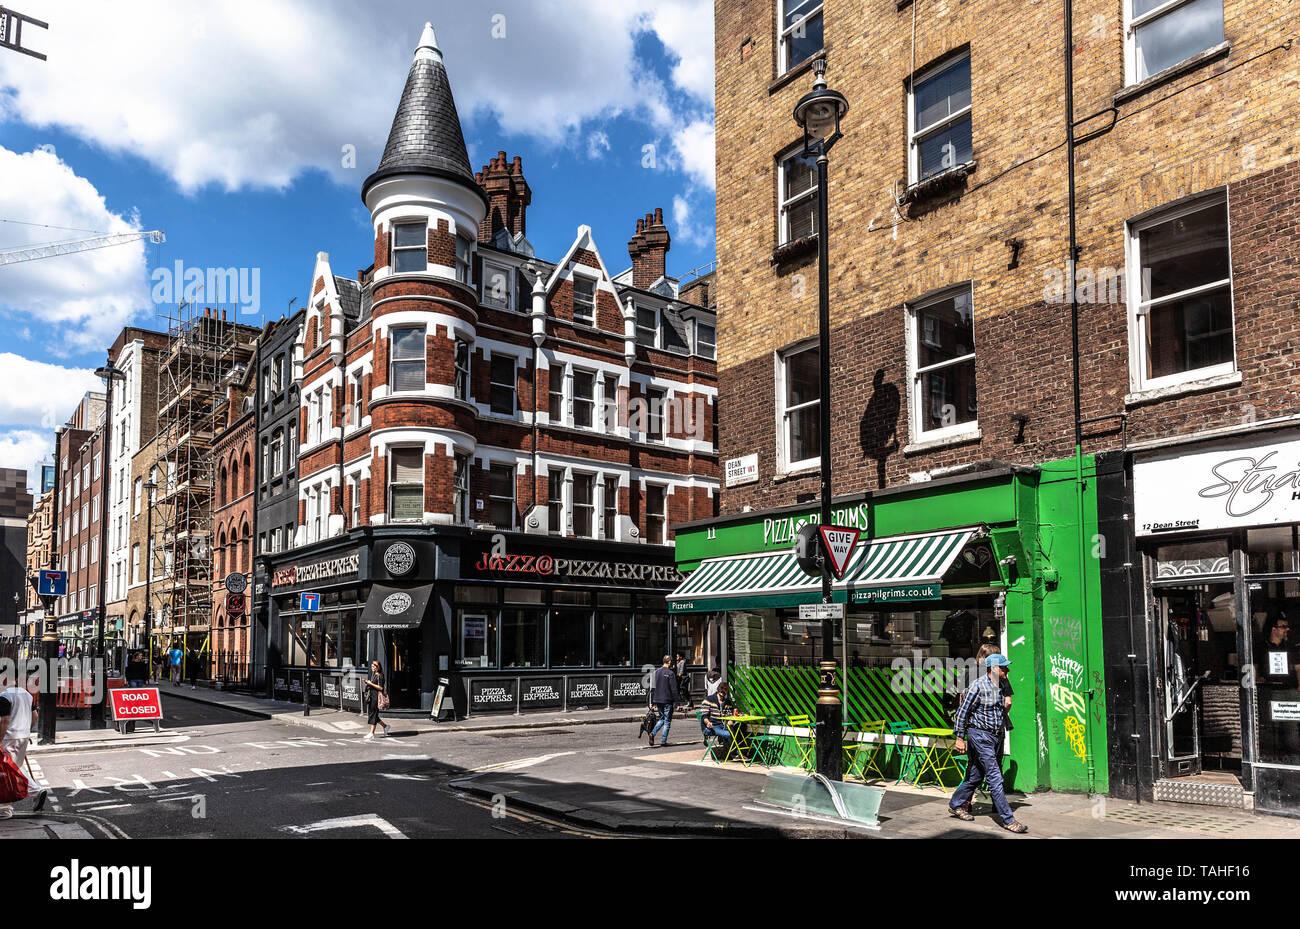 Dean Street, Soho, London, England, UK. - Stock Image